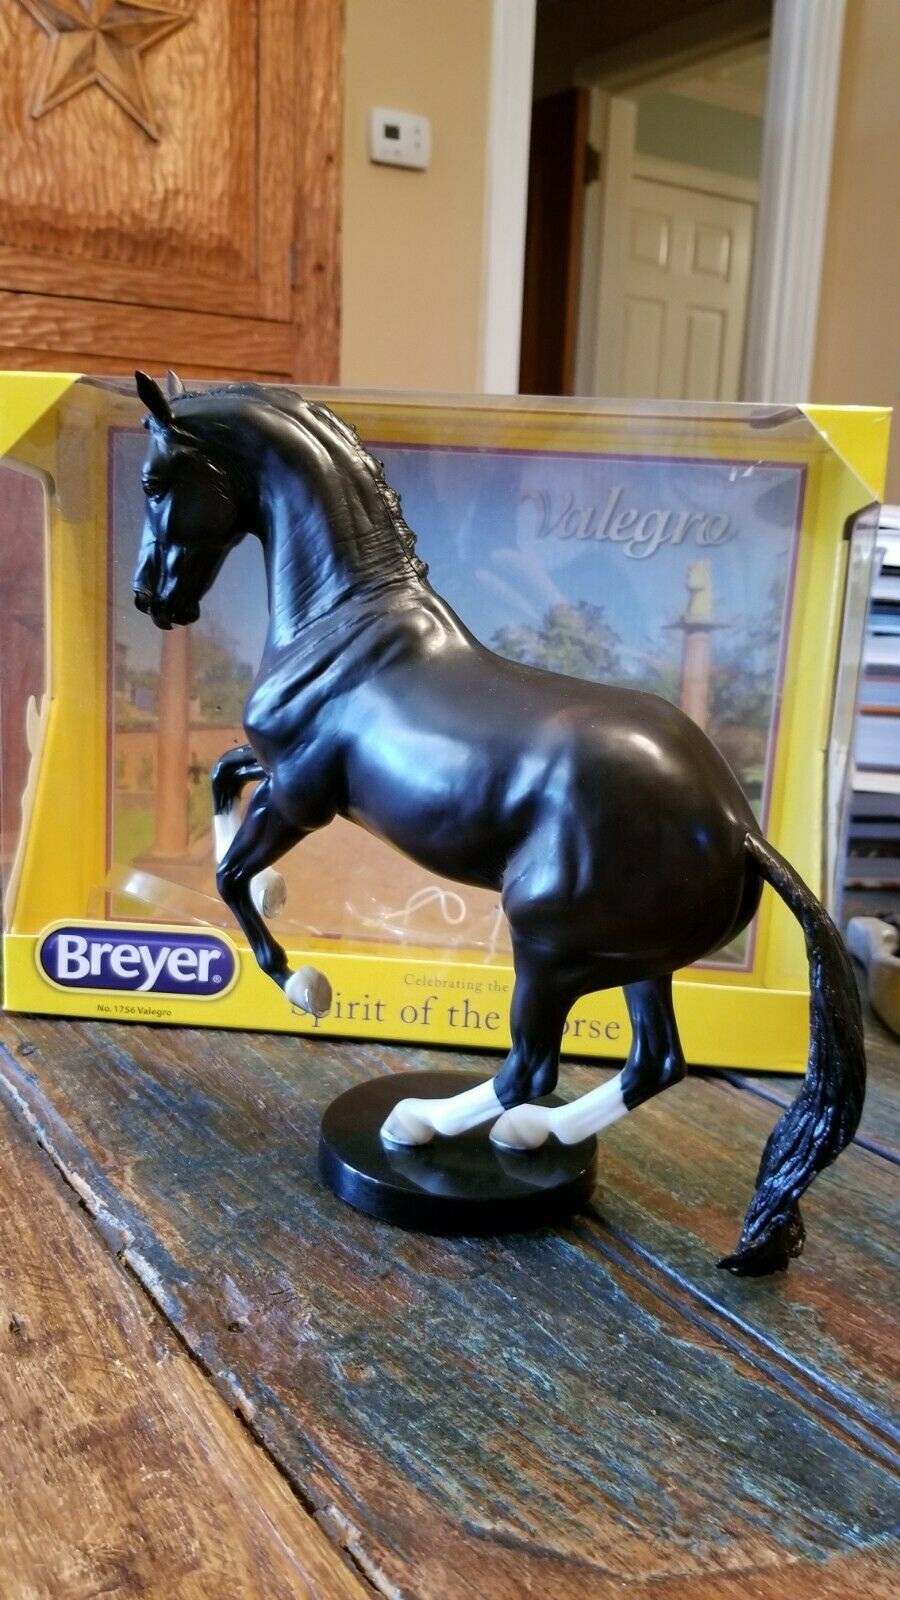 Breyer Valegro 1756 Traditional Model Horse Dressage